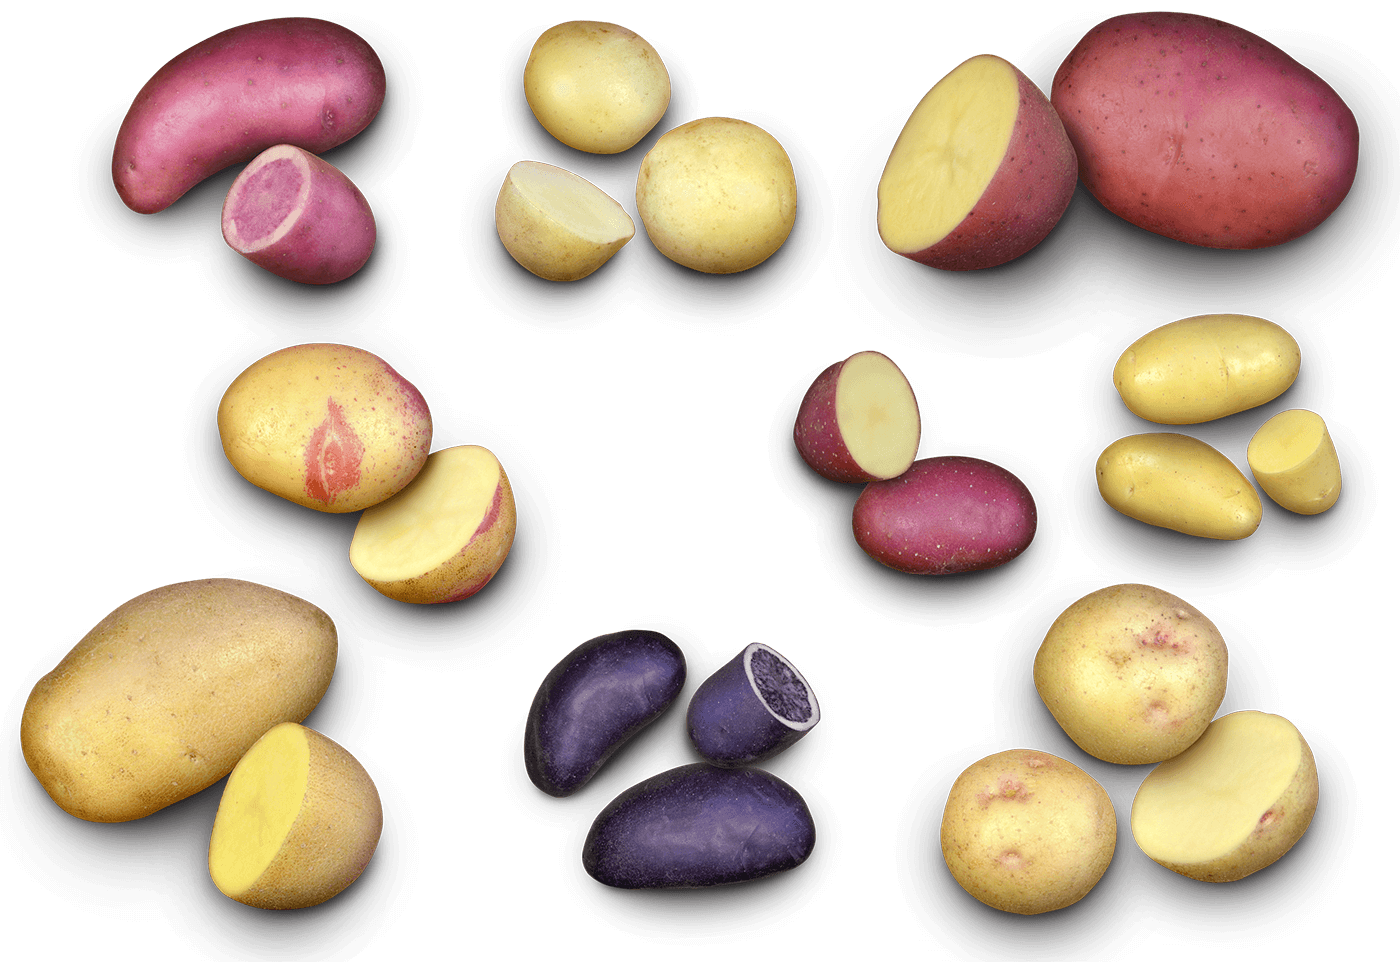 EarthApples Seed Potatoes Canada